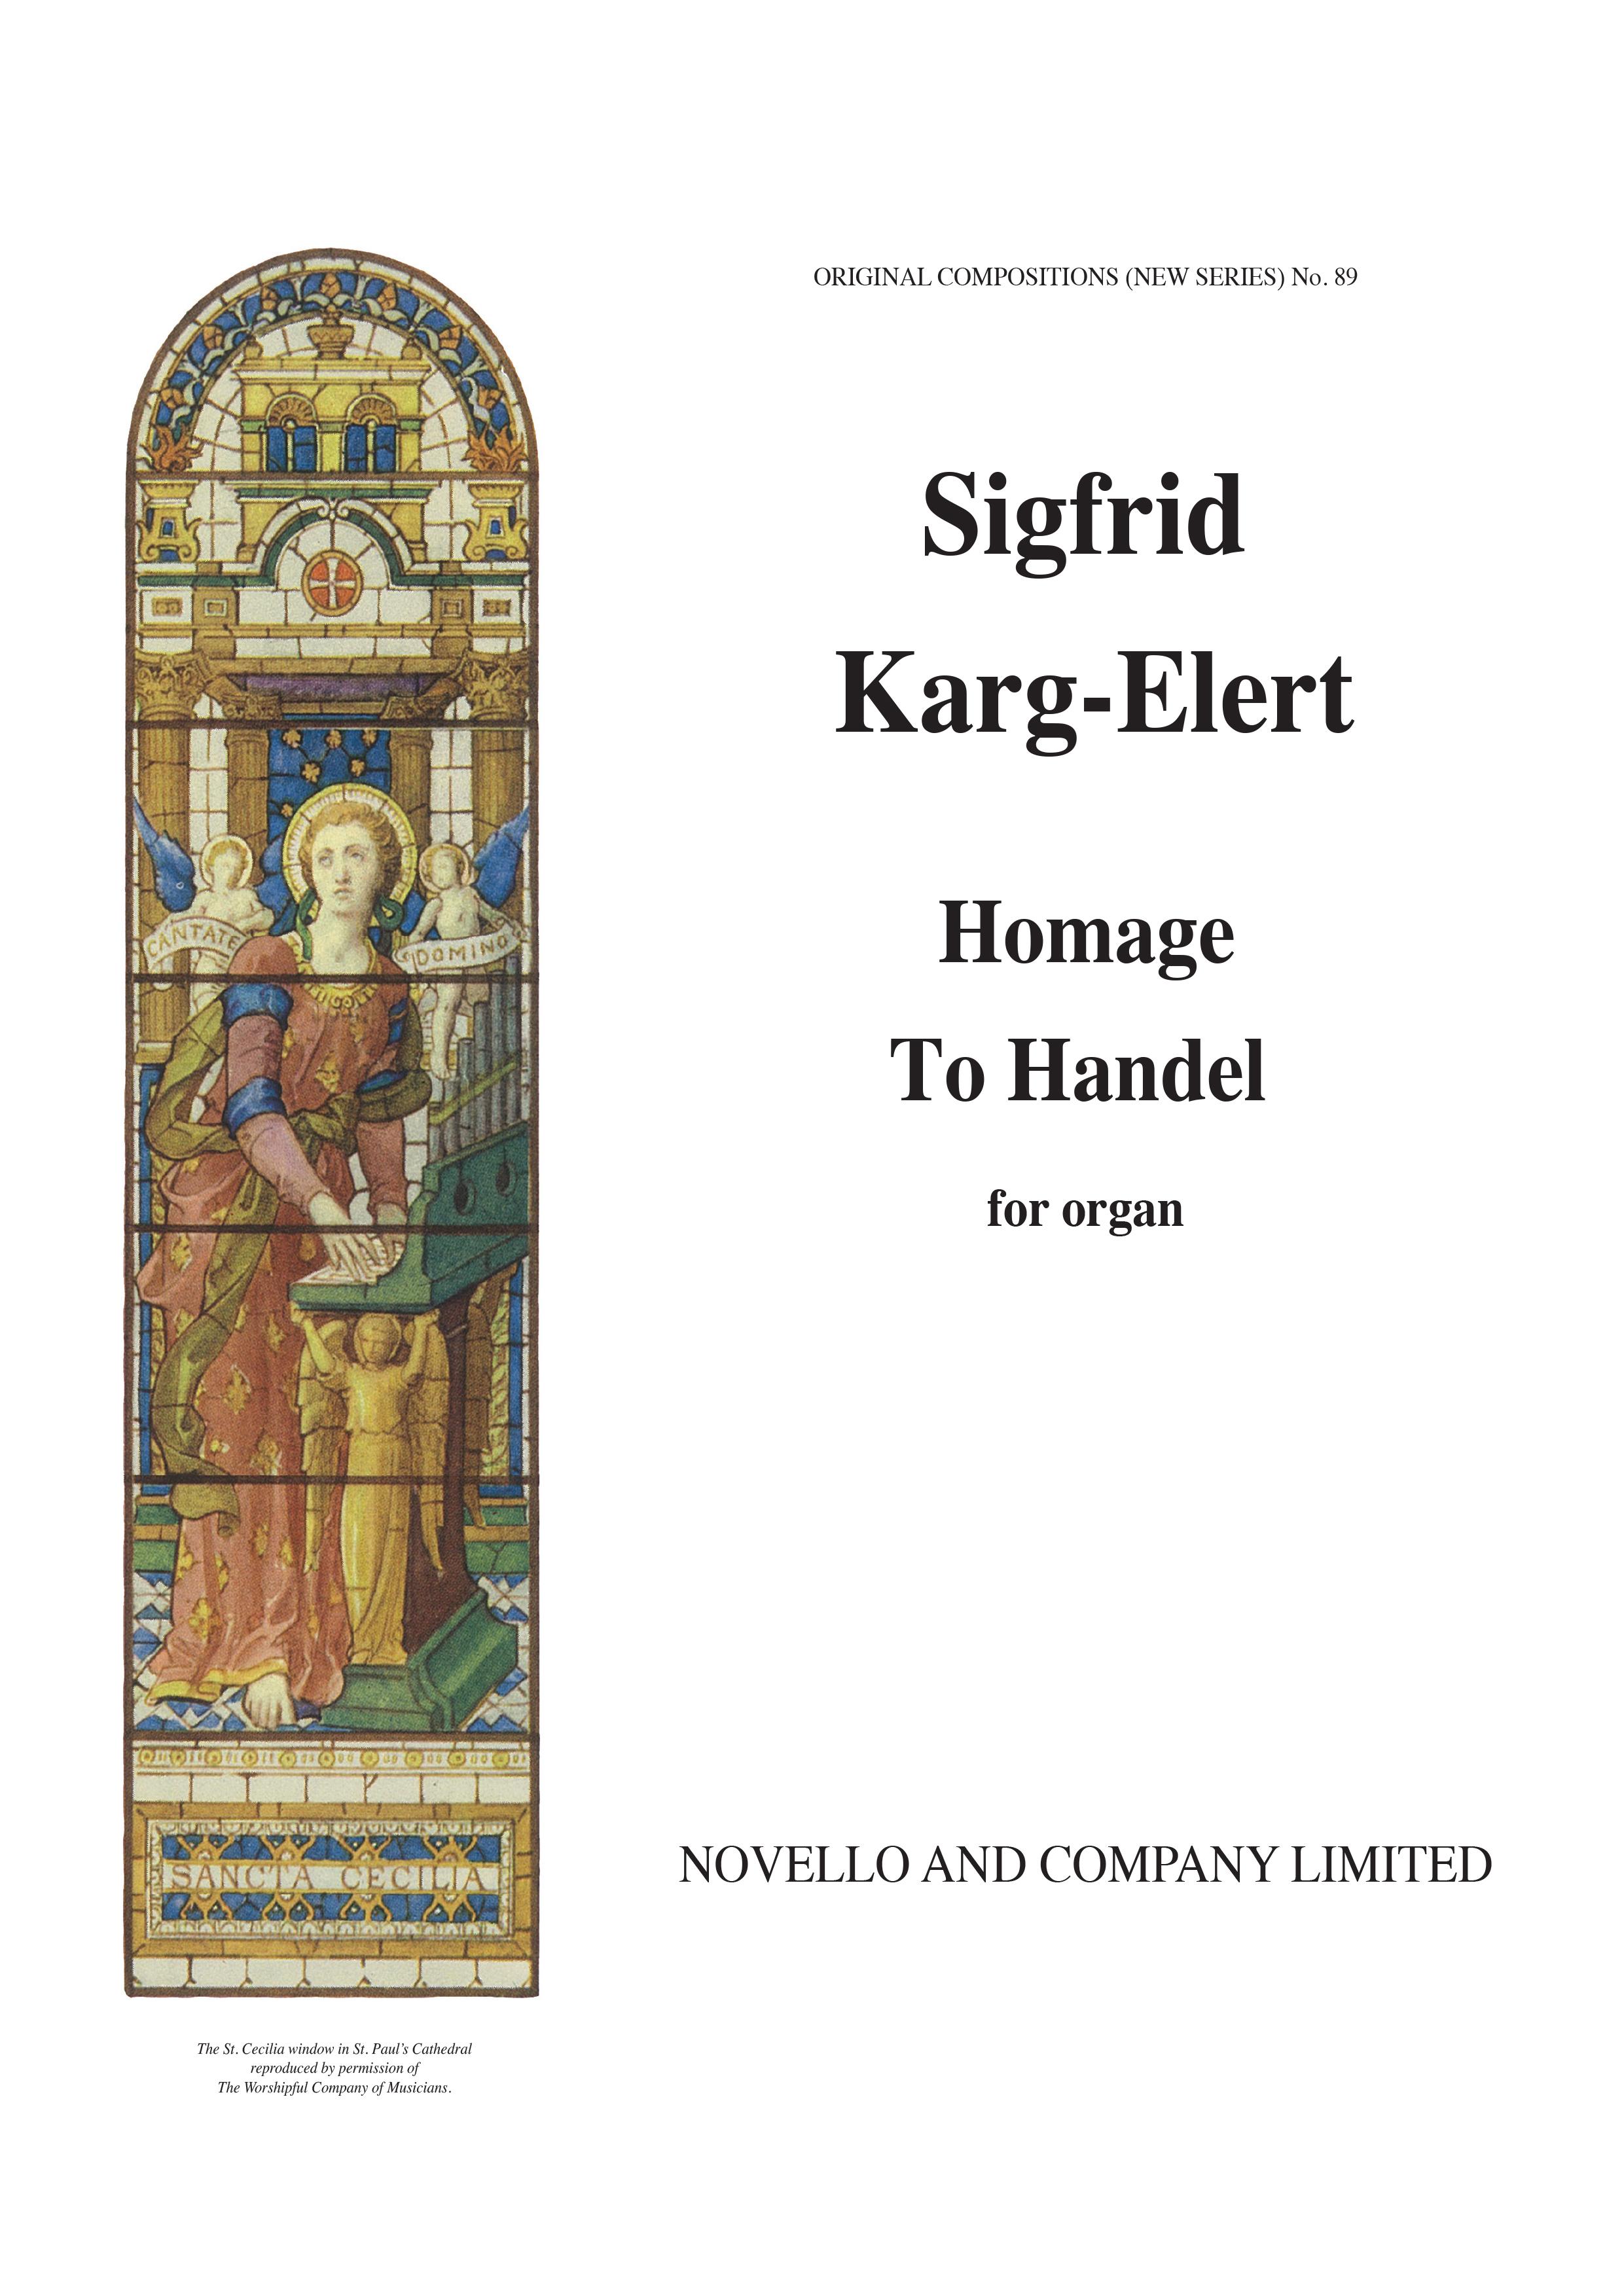 Sigfrid Karg-Elert: Homage To Handel (54 Variations For ): Organ: Instrumental